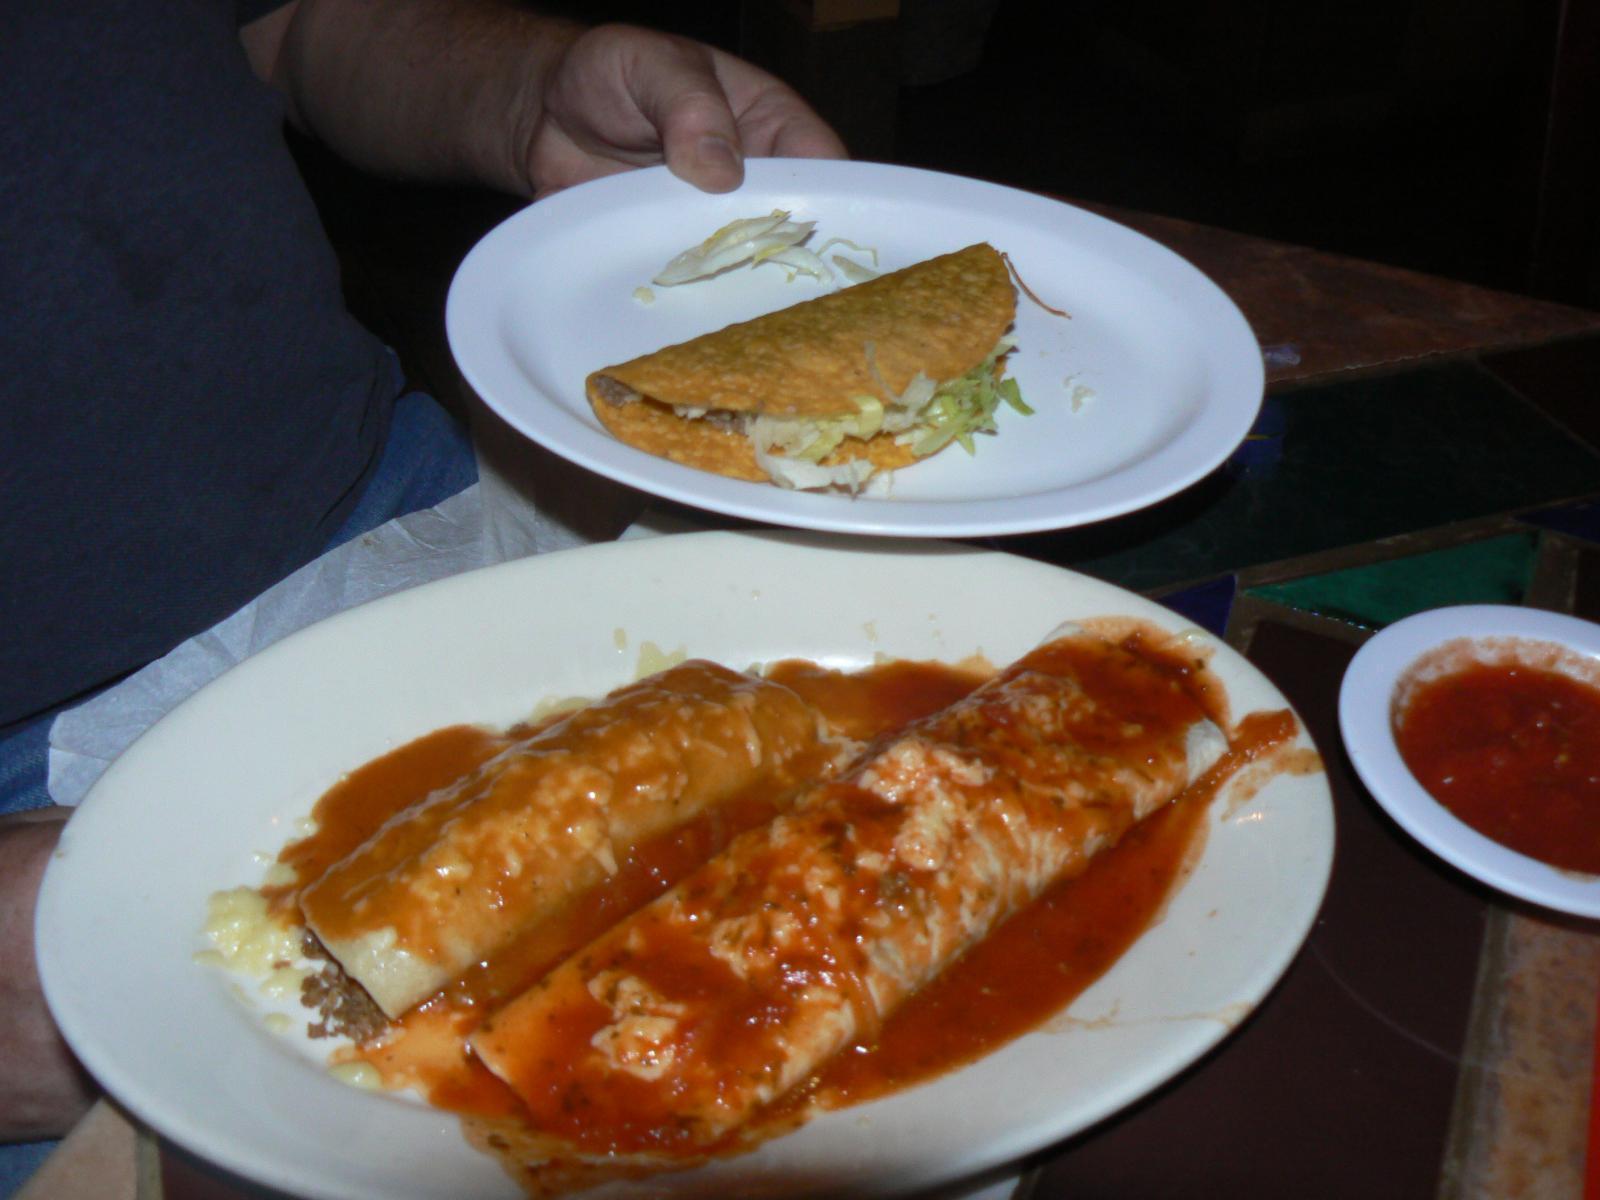 Jalapeno Joe's ...great food